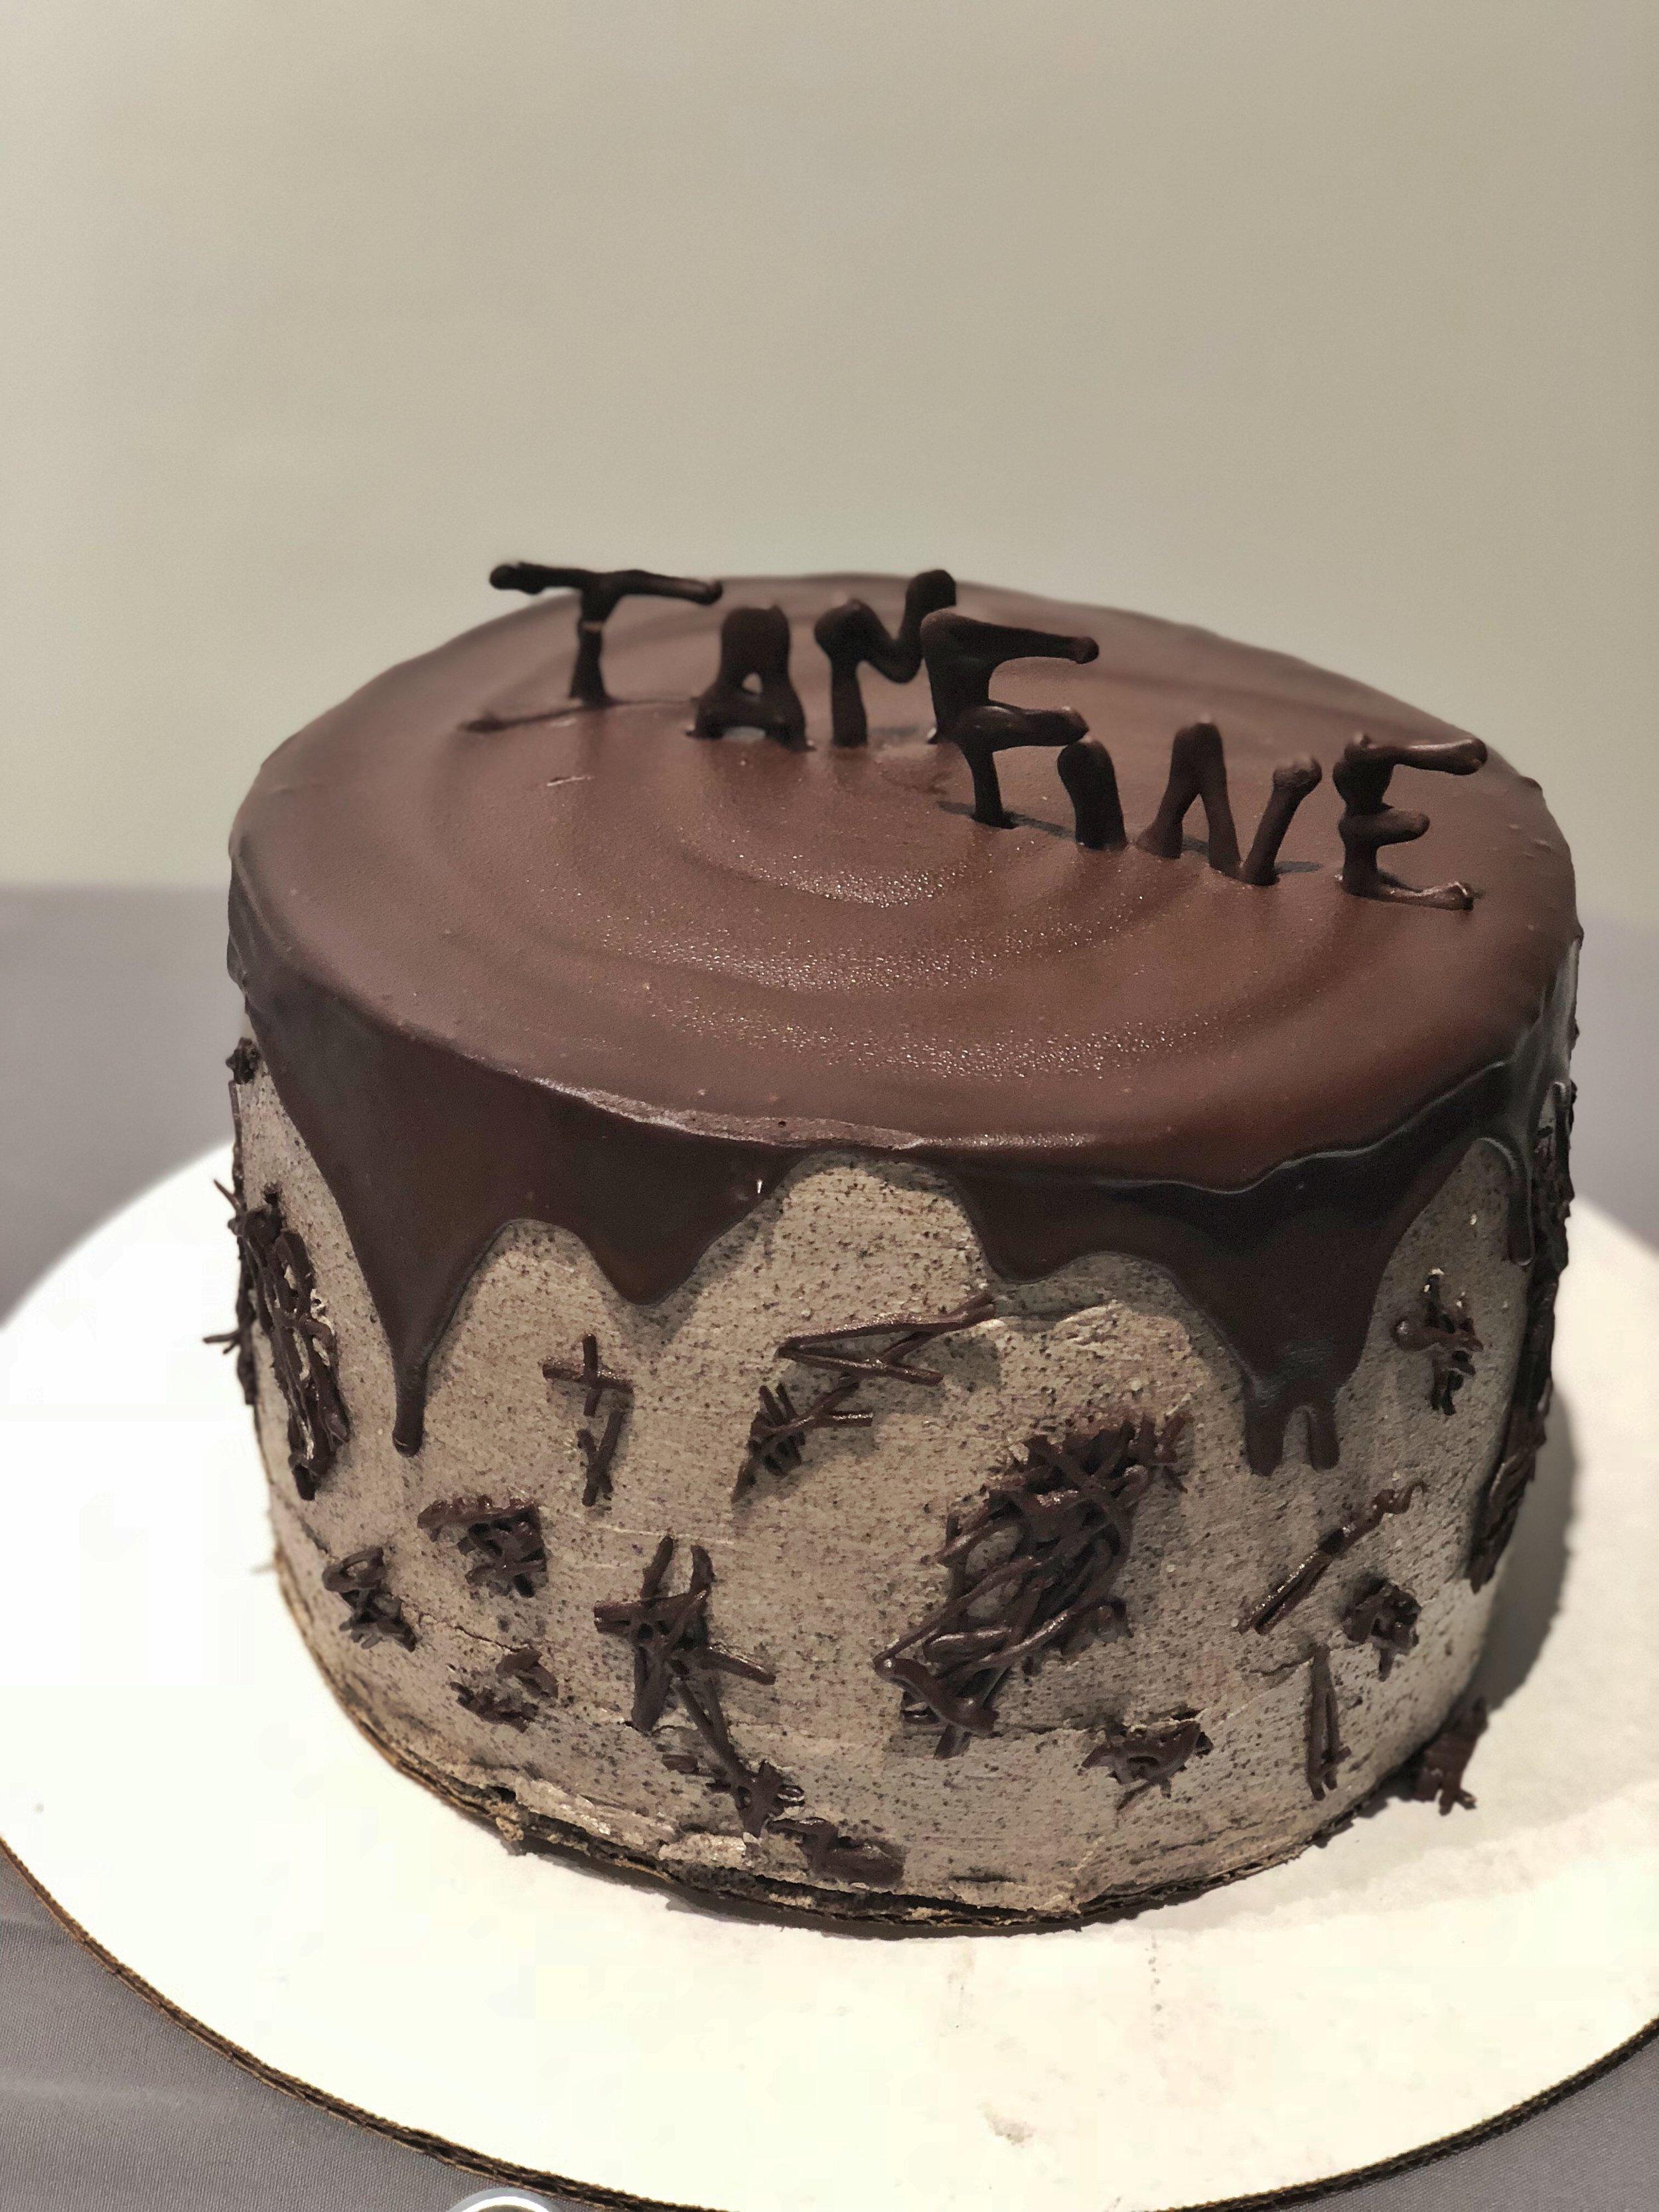 depressed-cake-shop-2.jpg